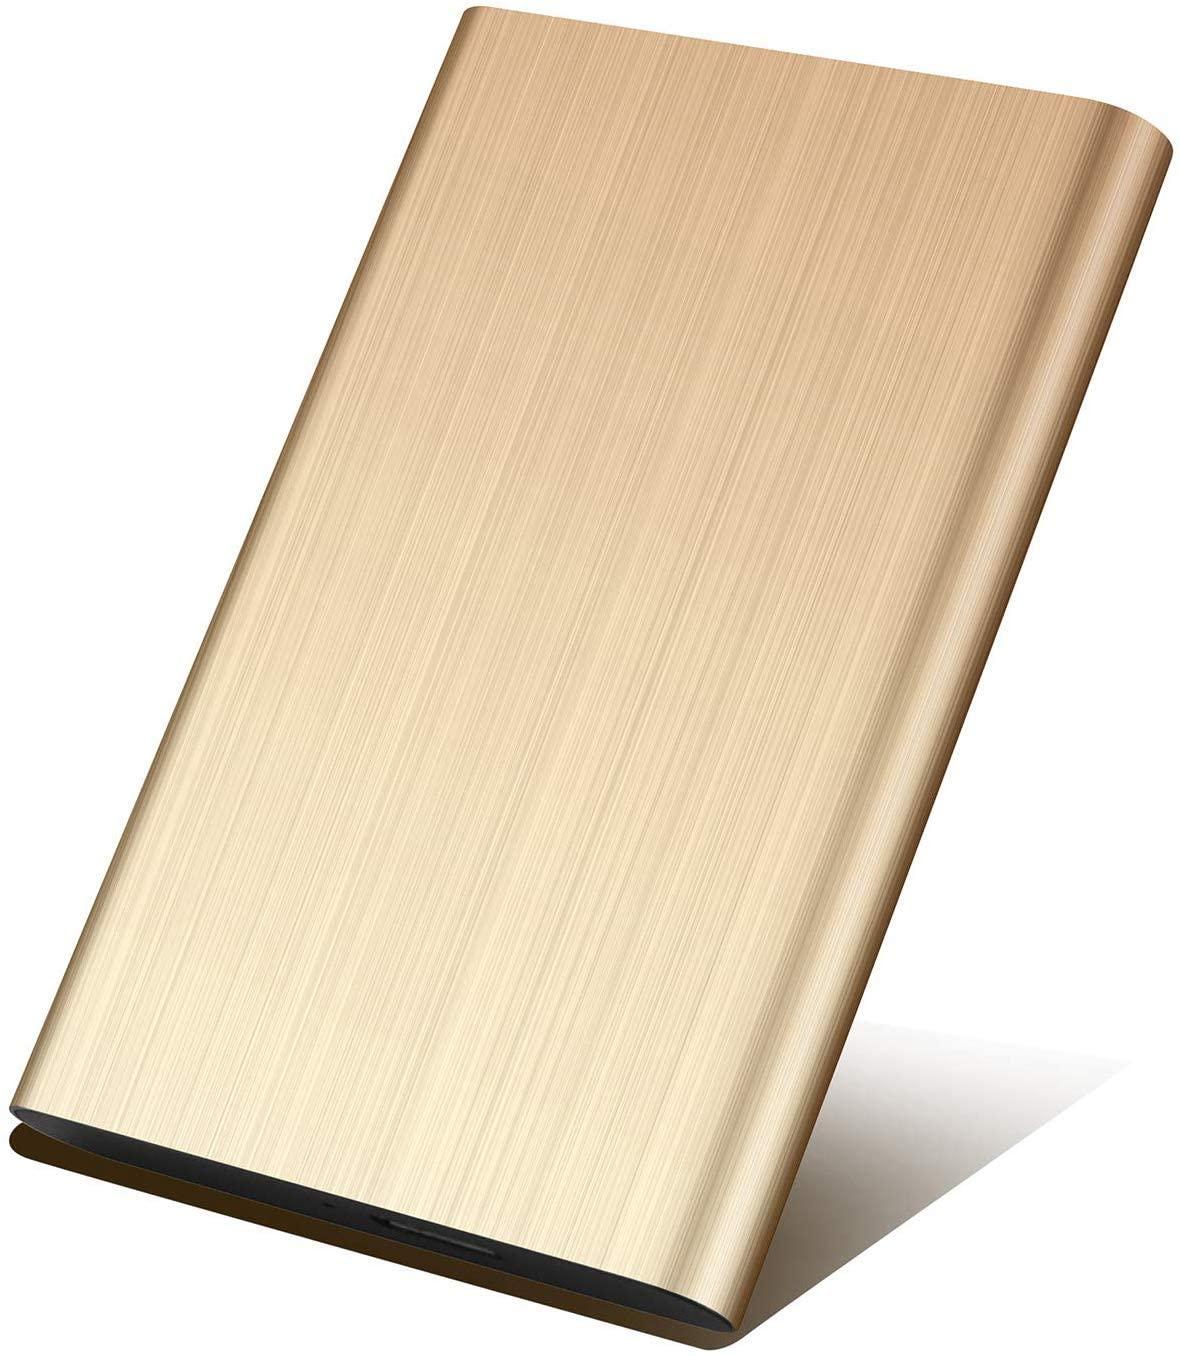 Portable External Hard Drive 1TB/2TB,Hard Drive External Ultra Thin External HDD External USB 3.0 Hard Drive for Mac PC and Laptop (2TB, Golden)